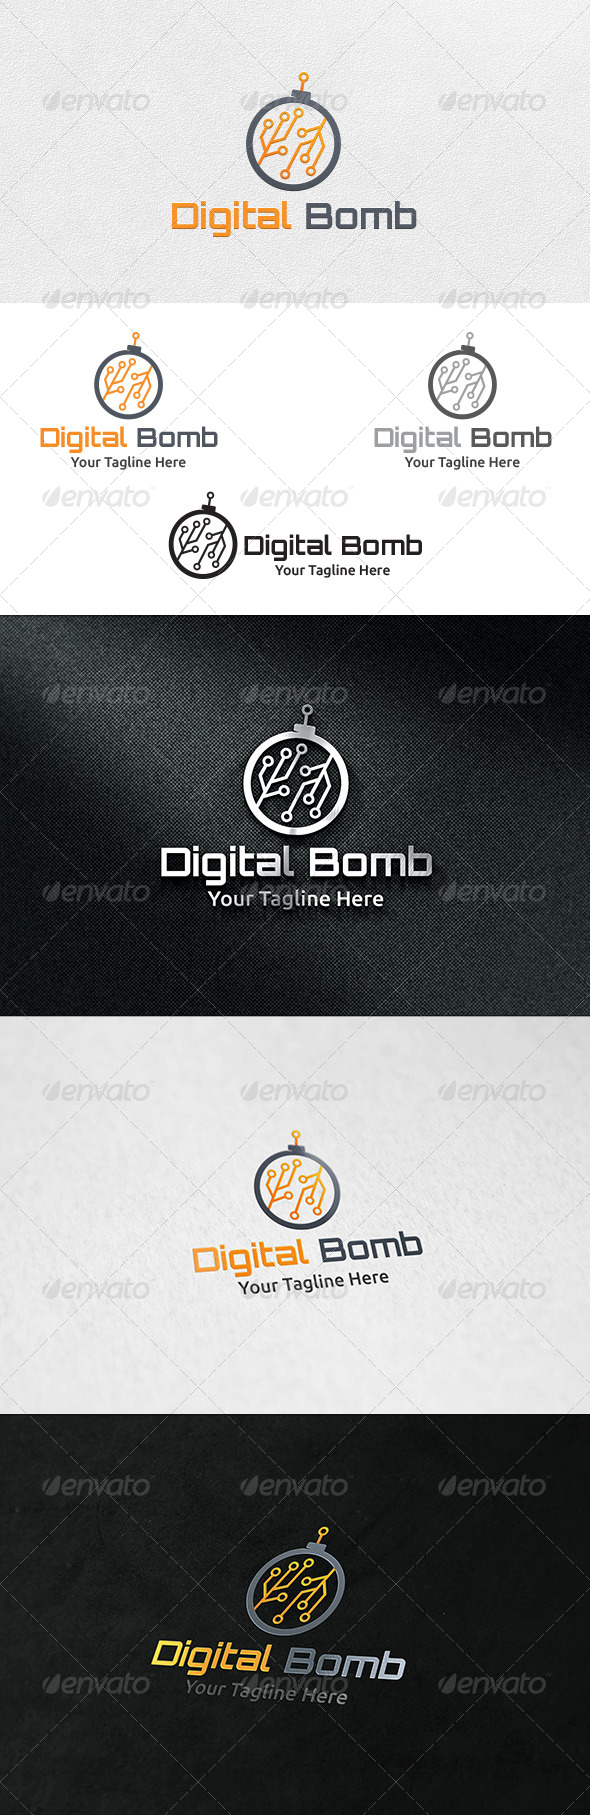 Digital Bomb - Logo Template